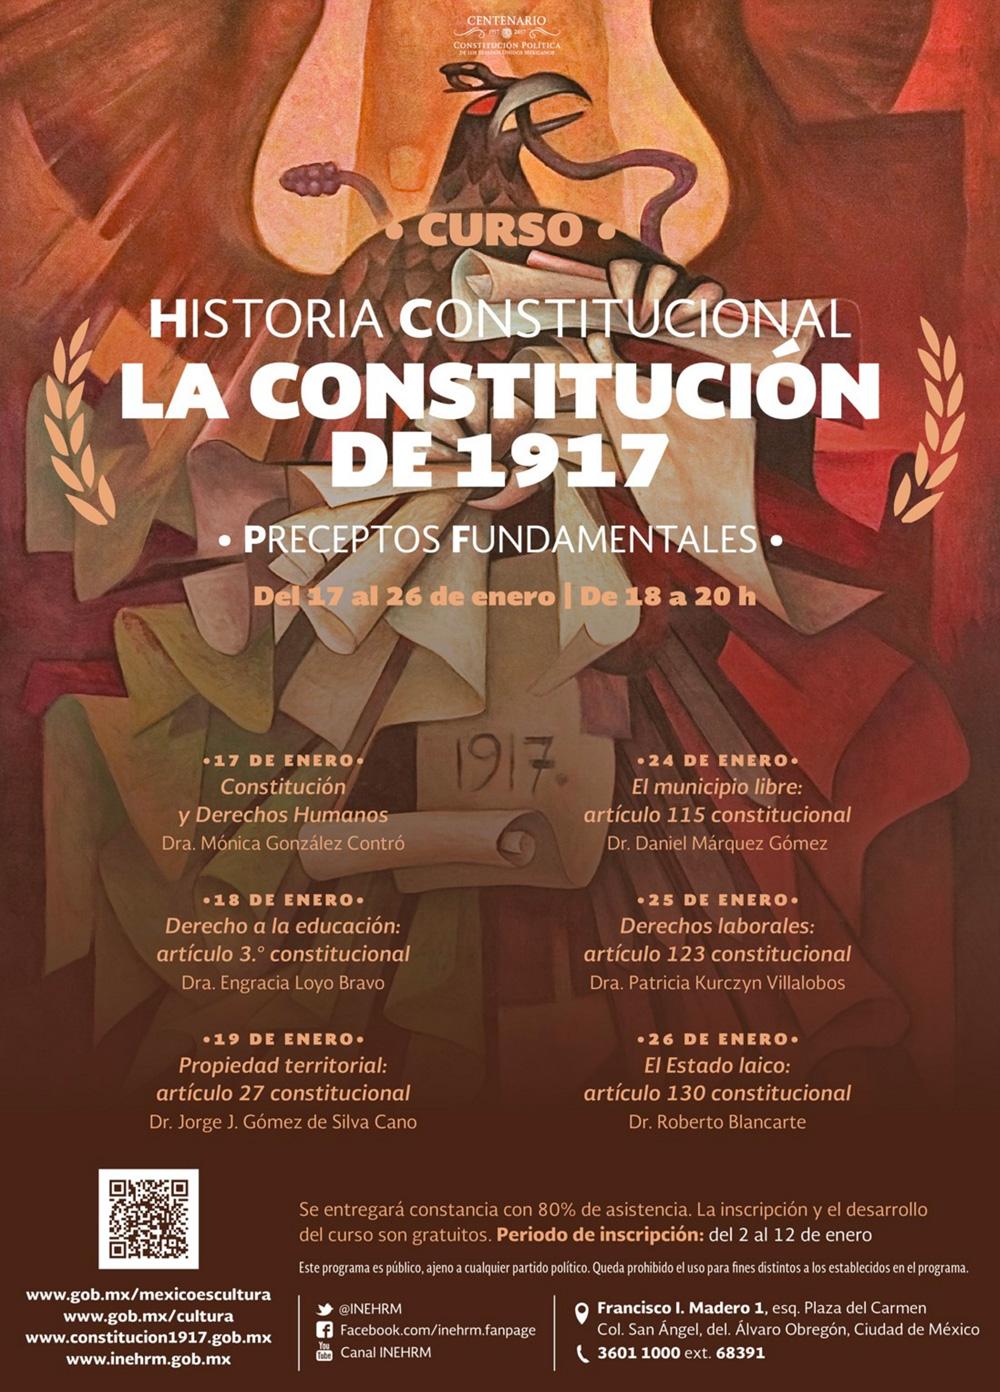 /cms/uploads/image/file/240200/constitucion1917-a.jpg